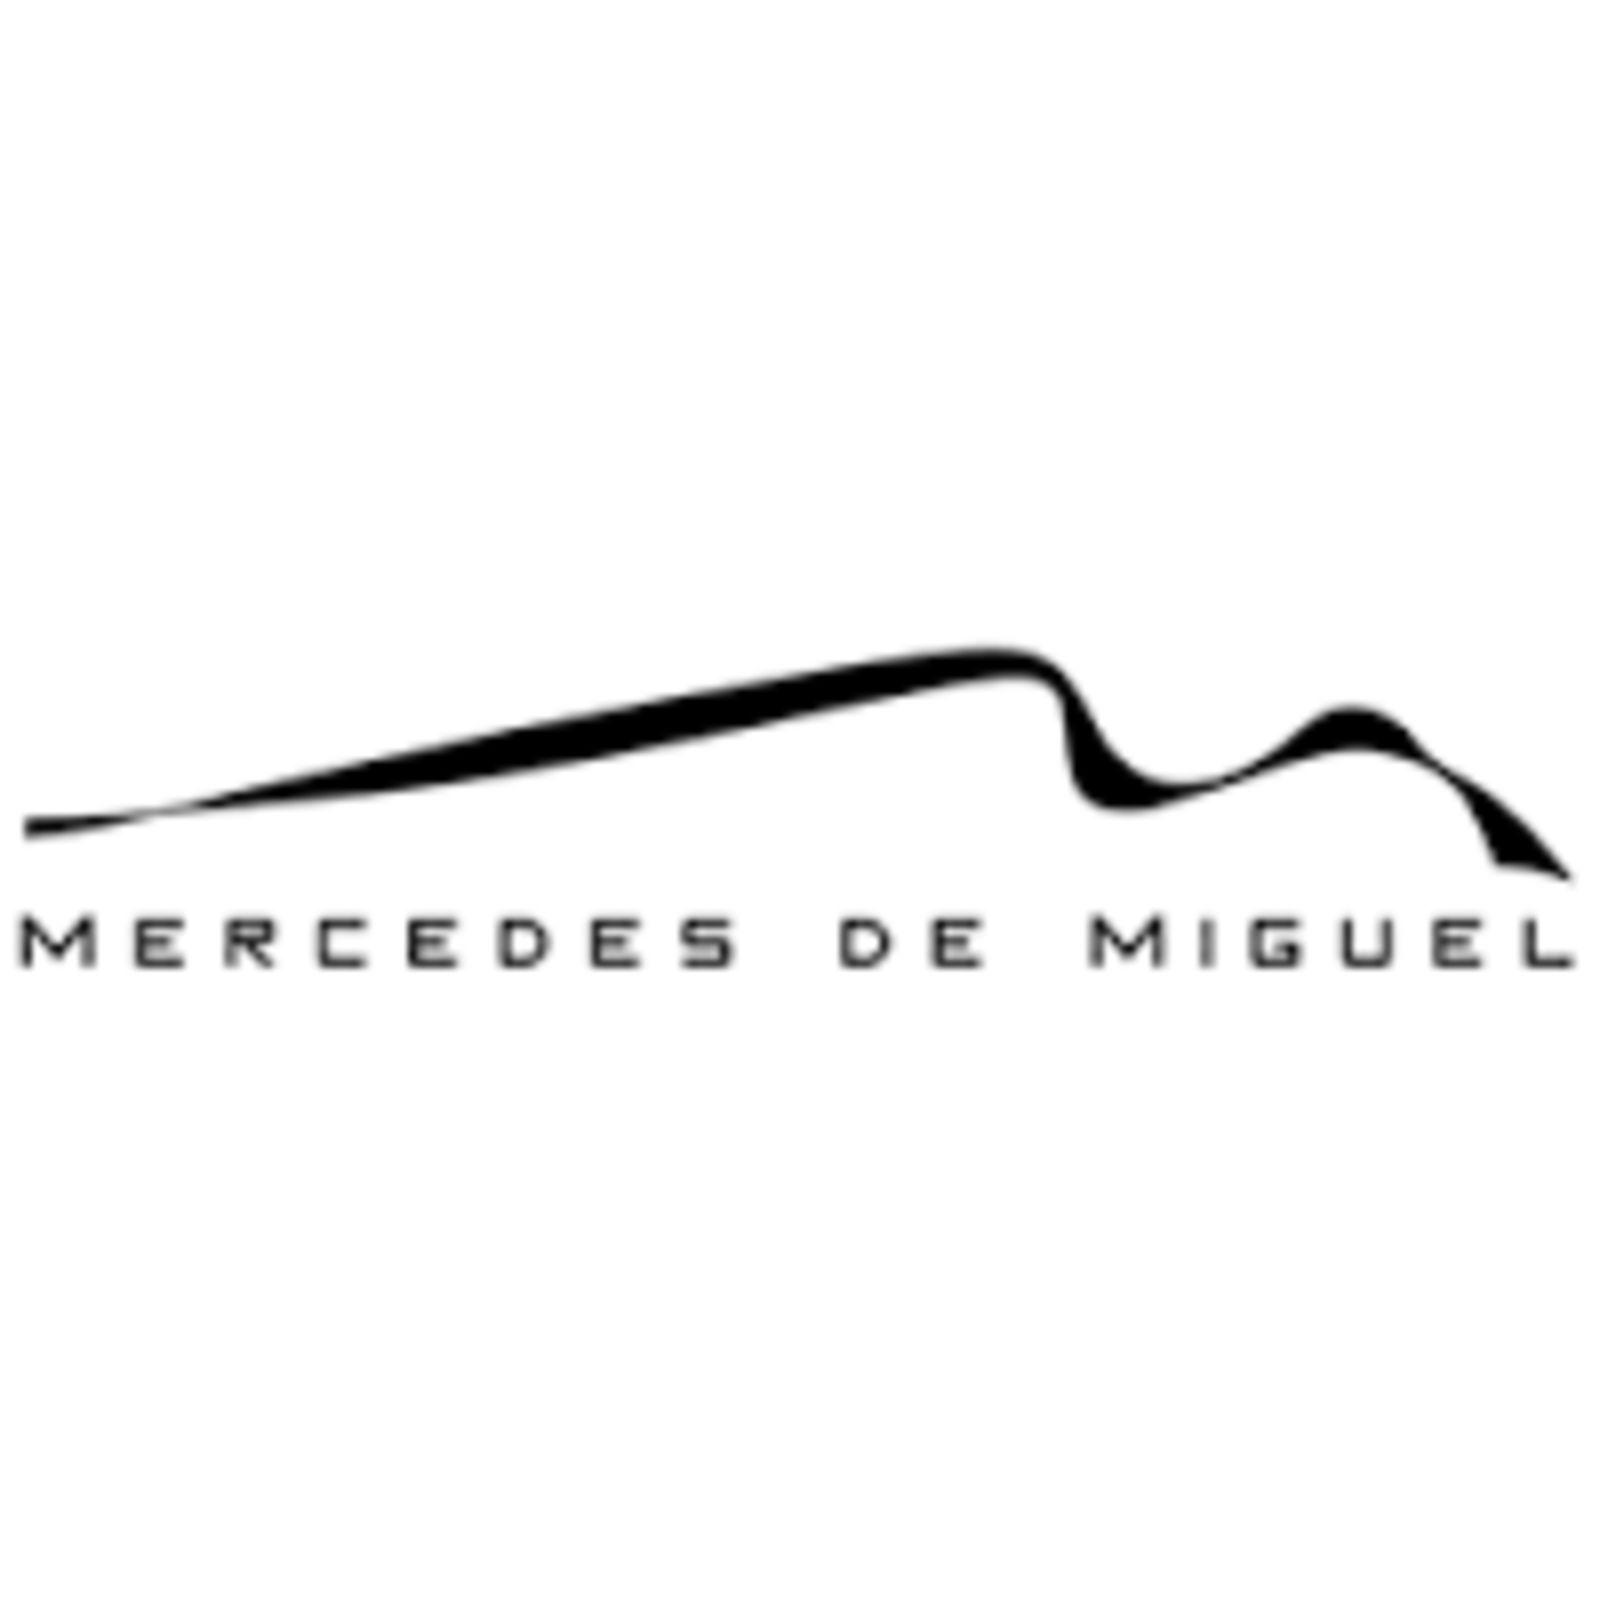 Mercedes de Miguel